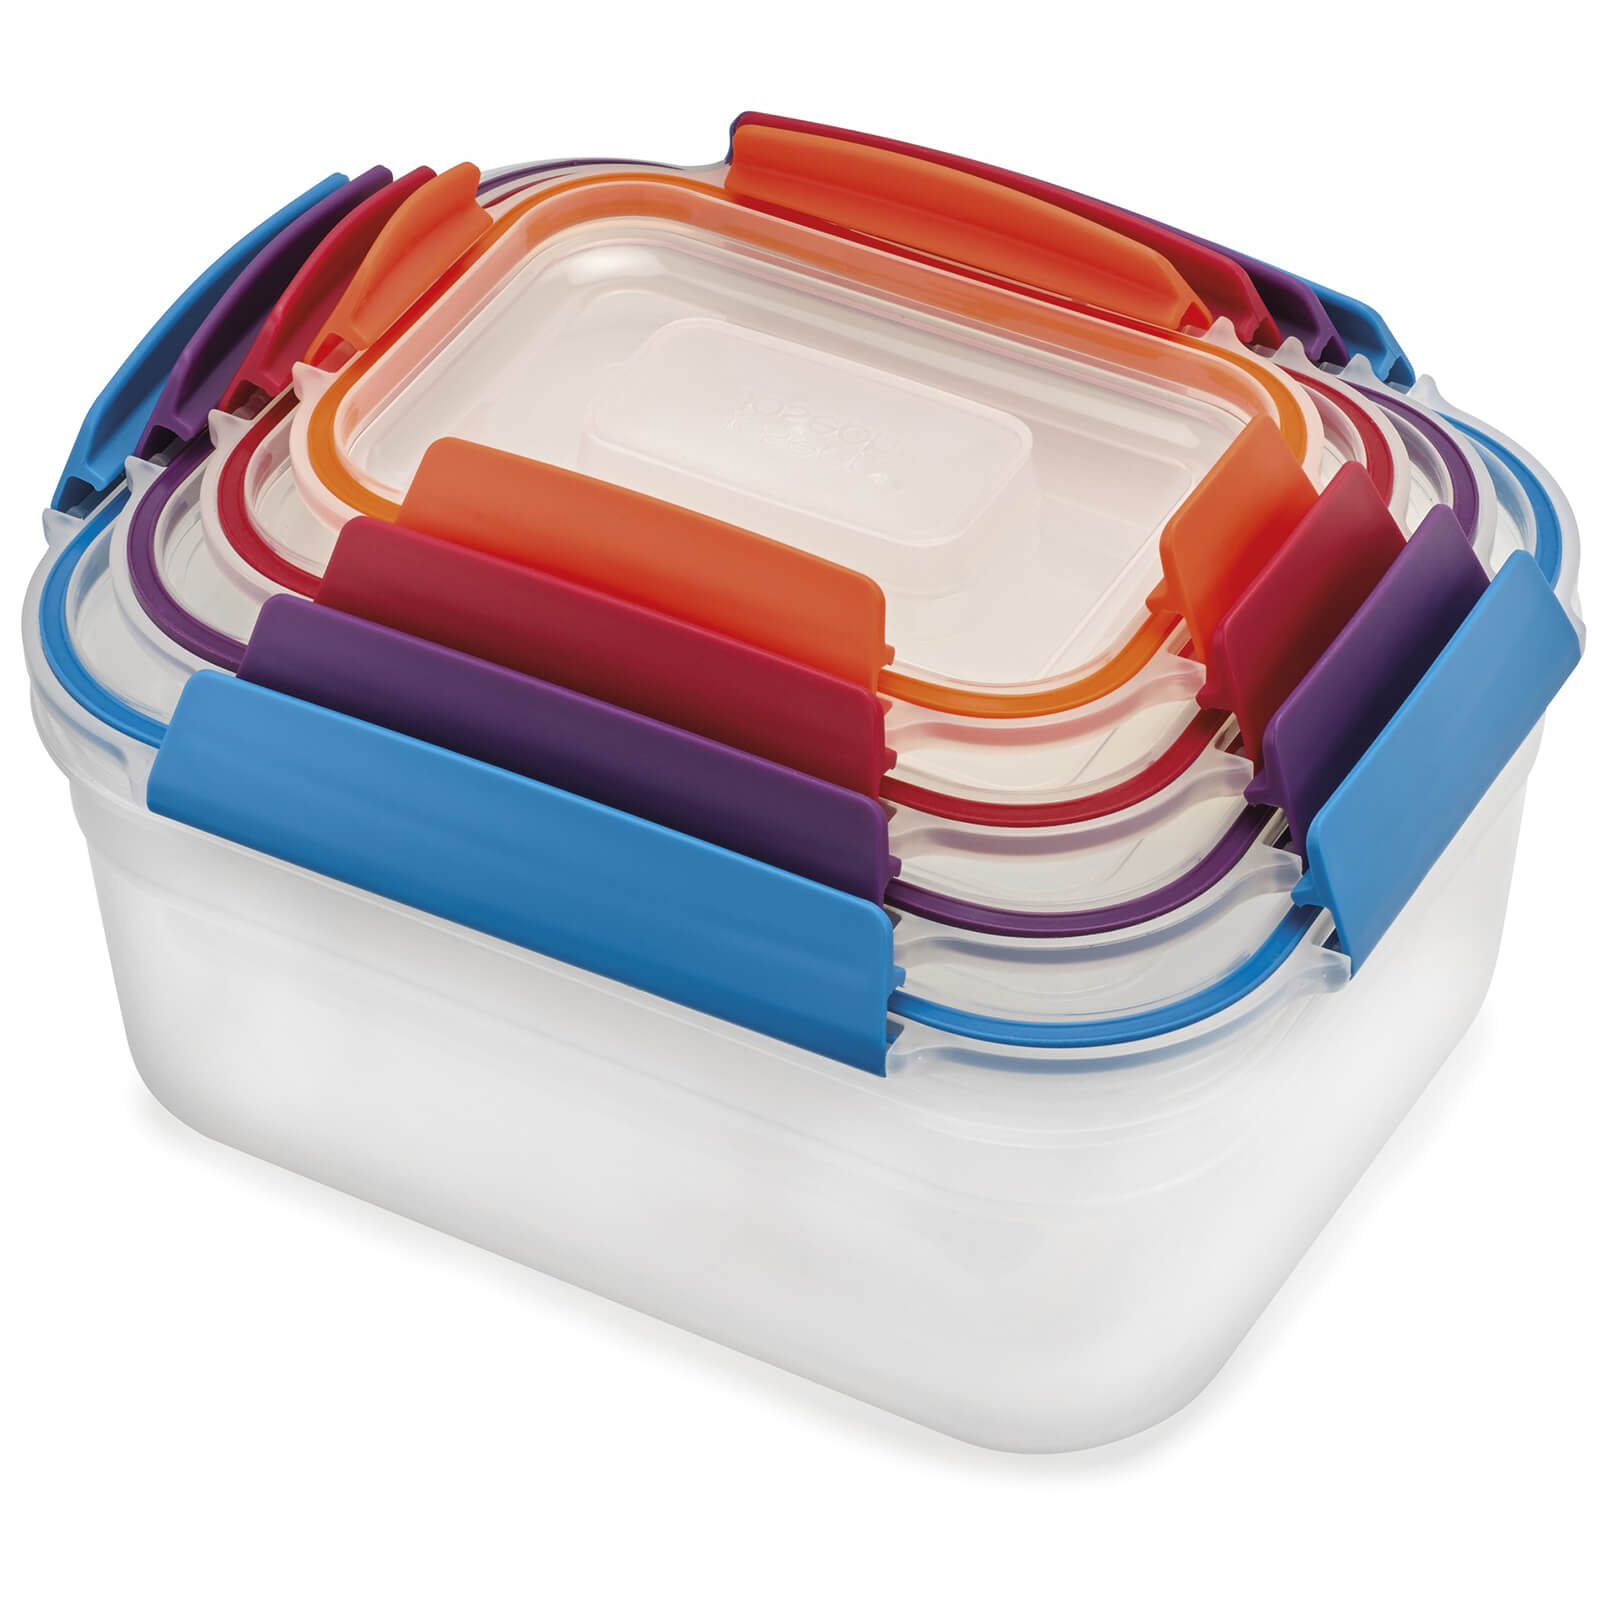 Joseph Joseph Nest Lock 4-Piece Container Set - Multicolour